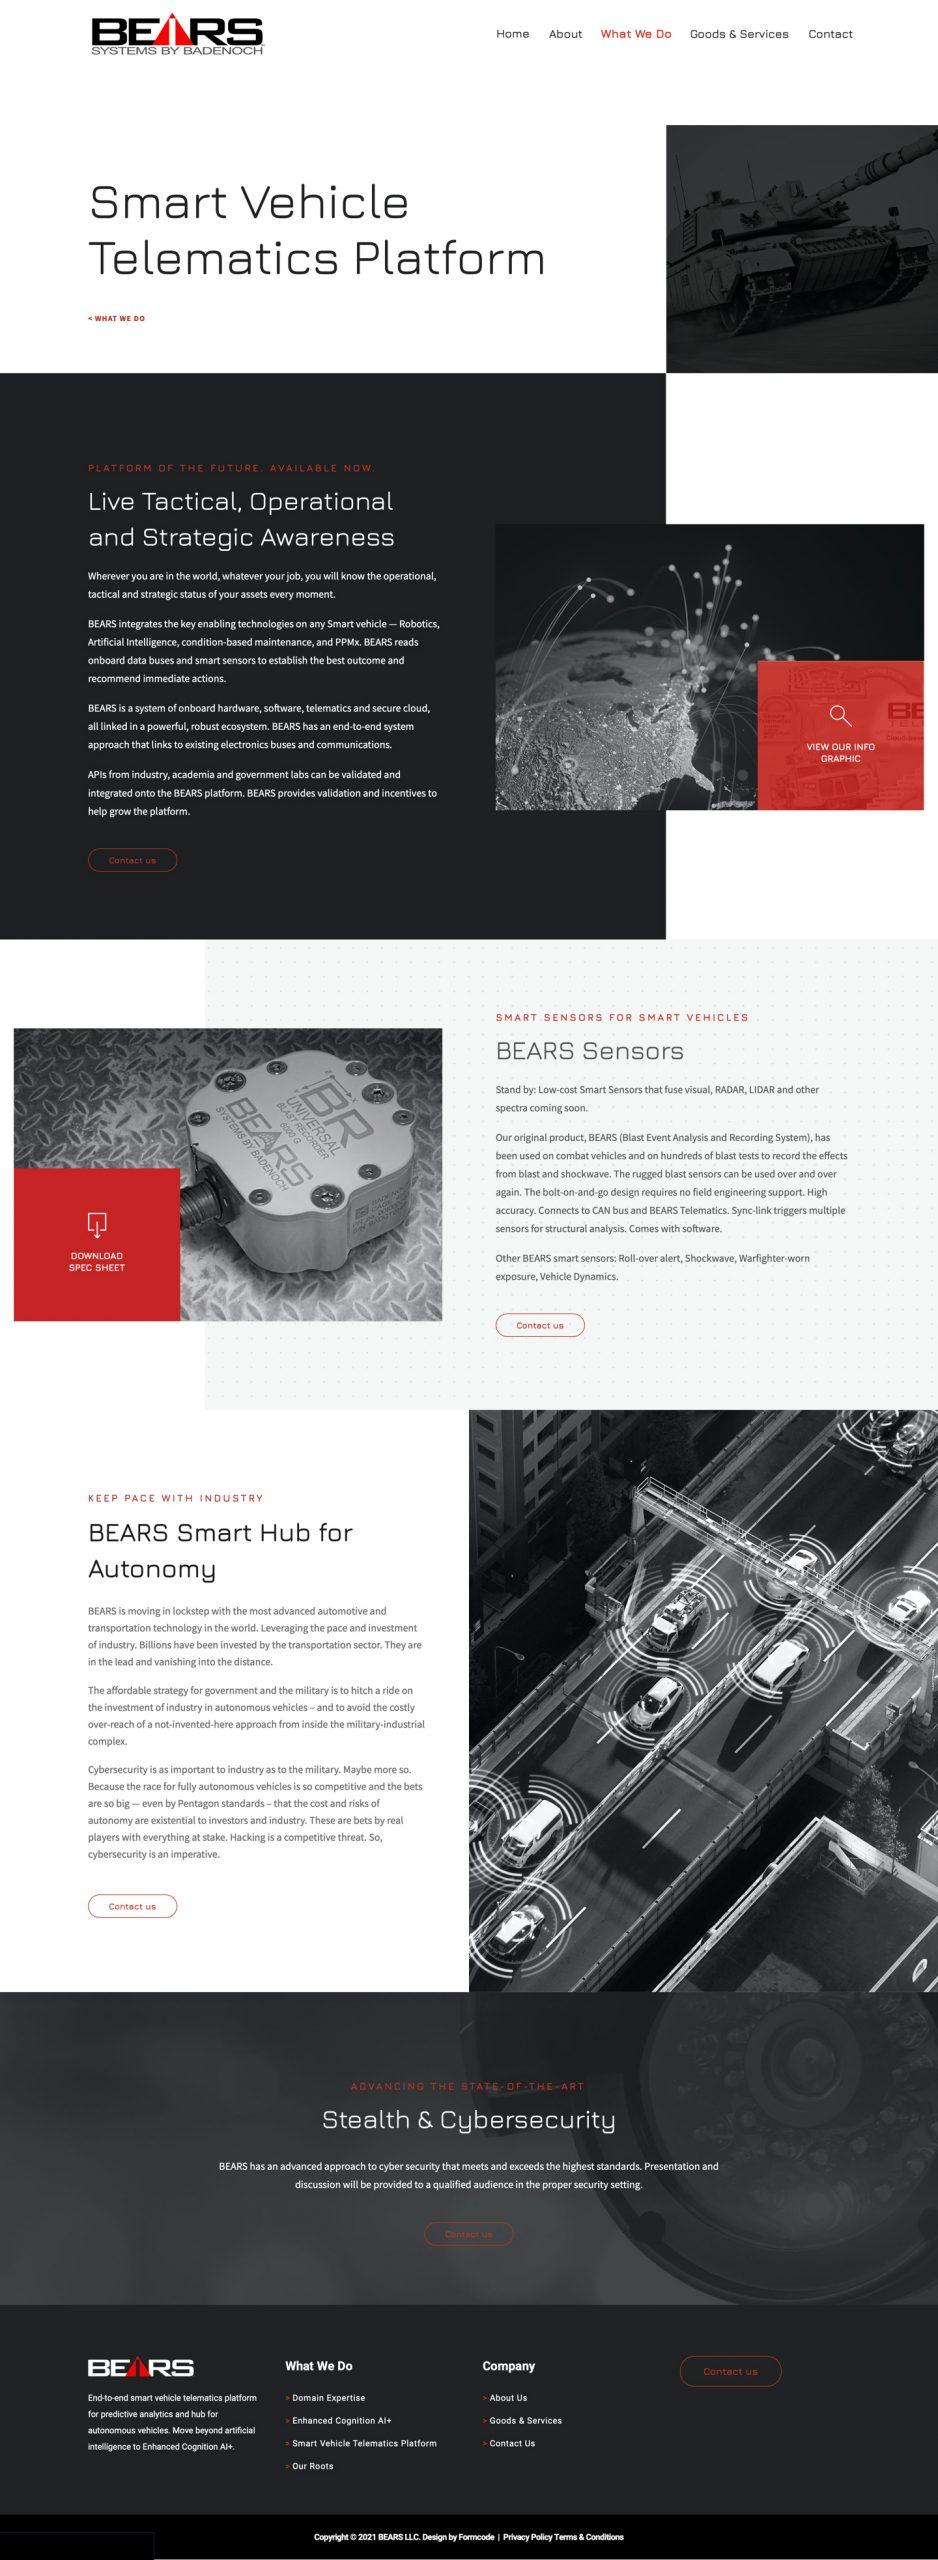 Defense & Technology Informational Web Design